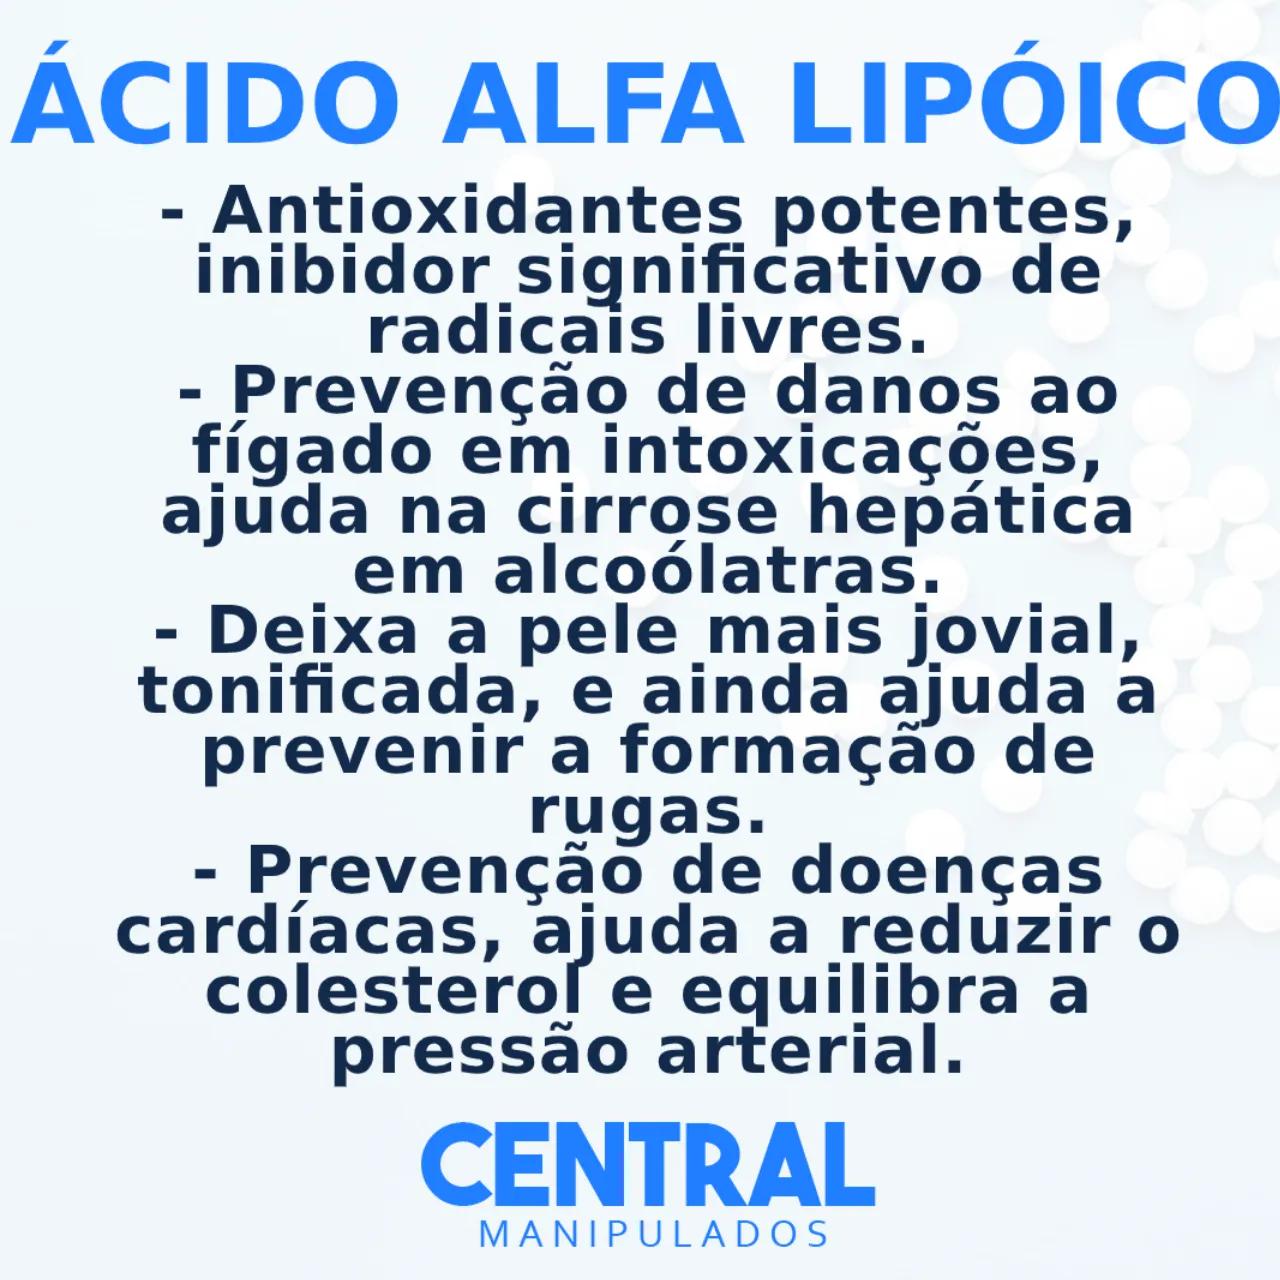 Ácido Alfa Lipóico 500mg - 30 cápsulas - Antioxidante, Auxílio na Proteção Hepática